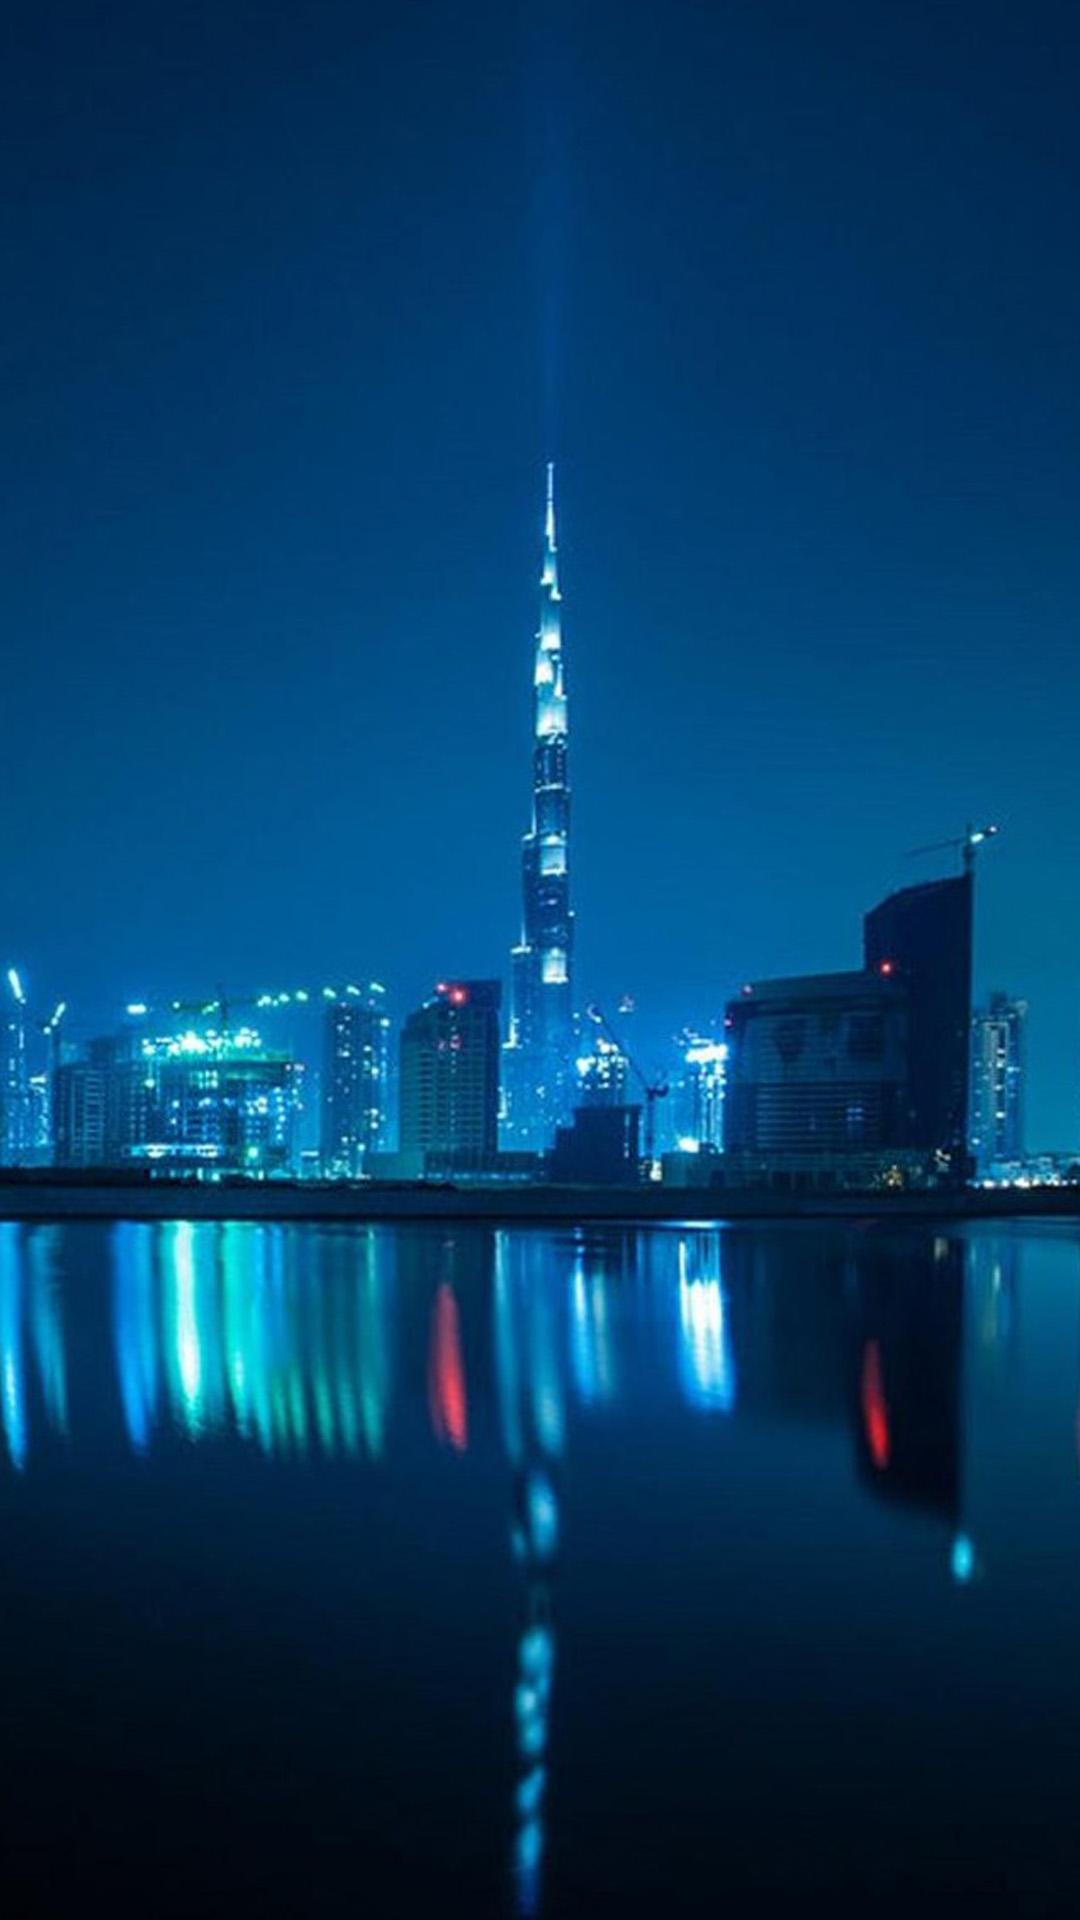 Dubai Burj Khalifa Wallpapers Wallpaper Cave